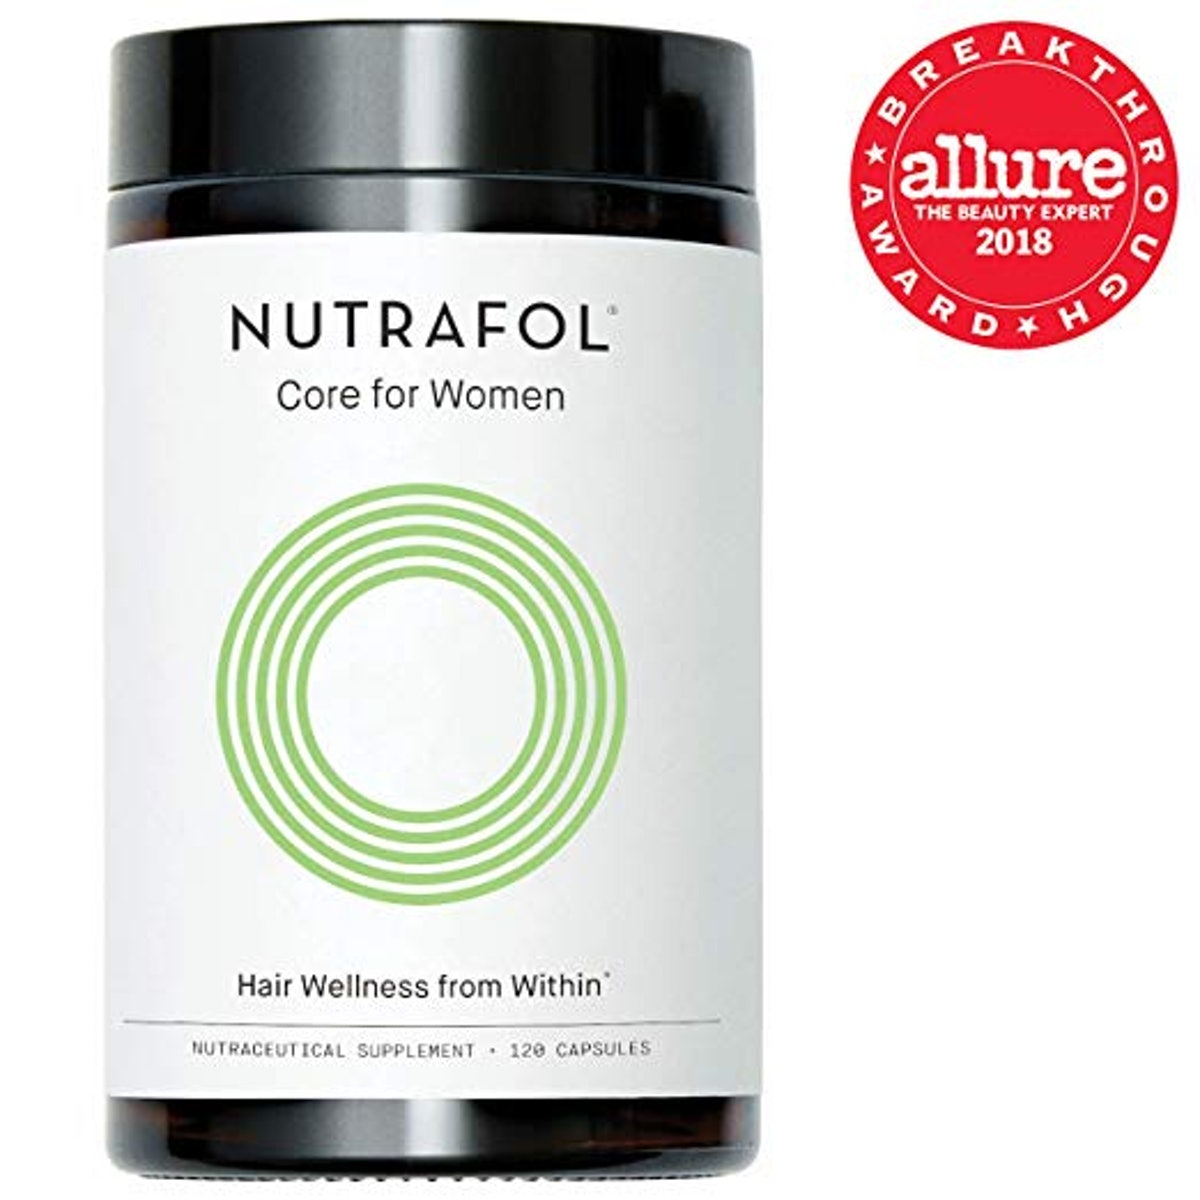 Nutrafol Hair Supplements For Women